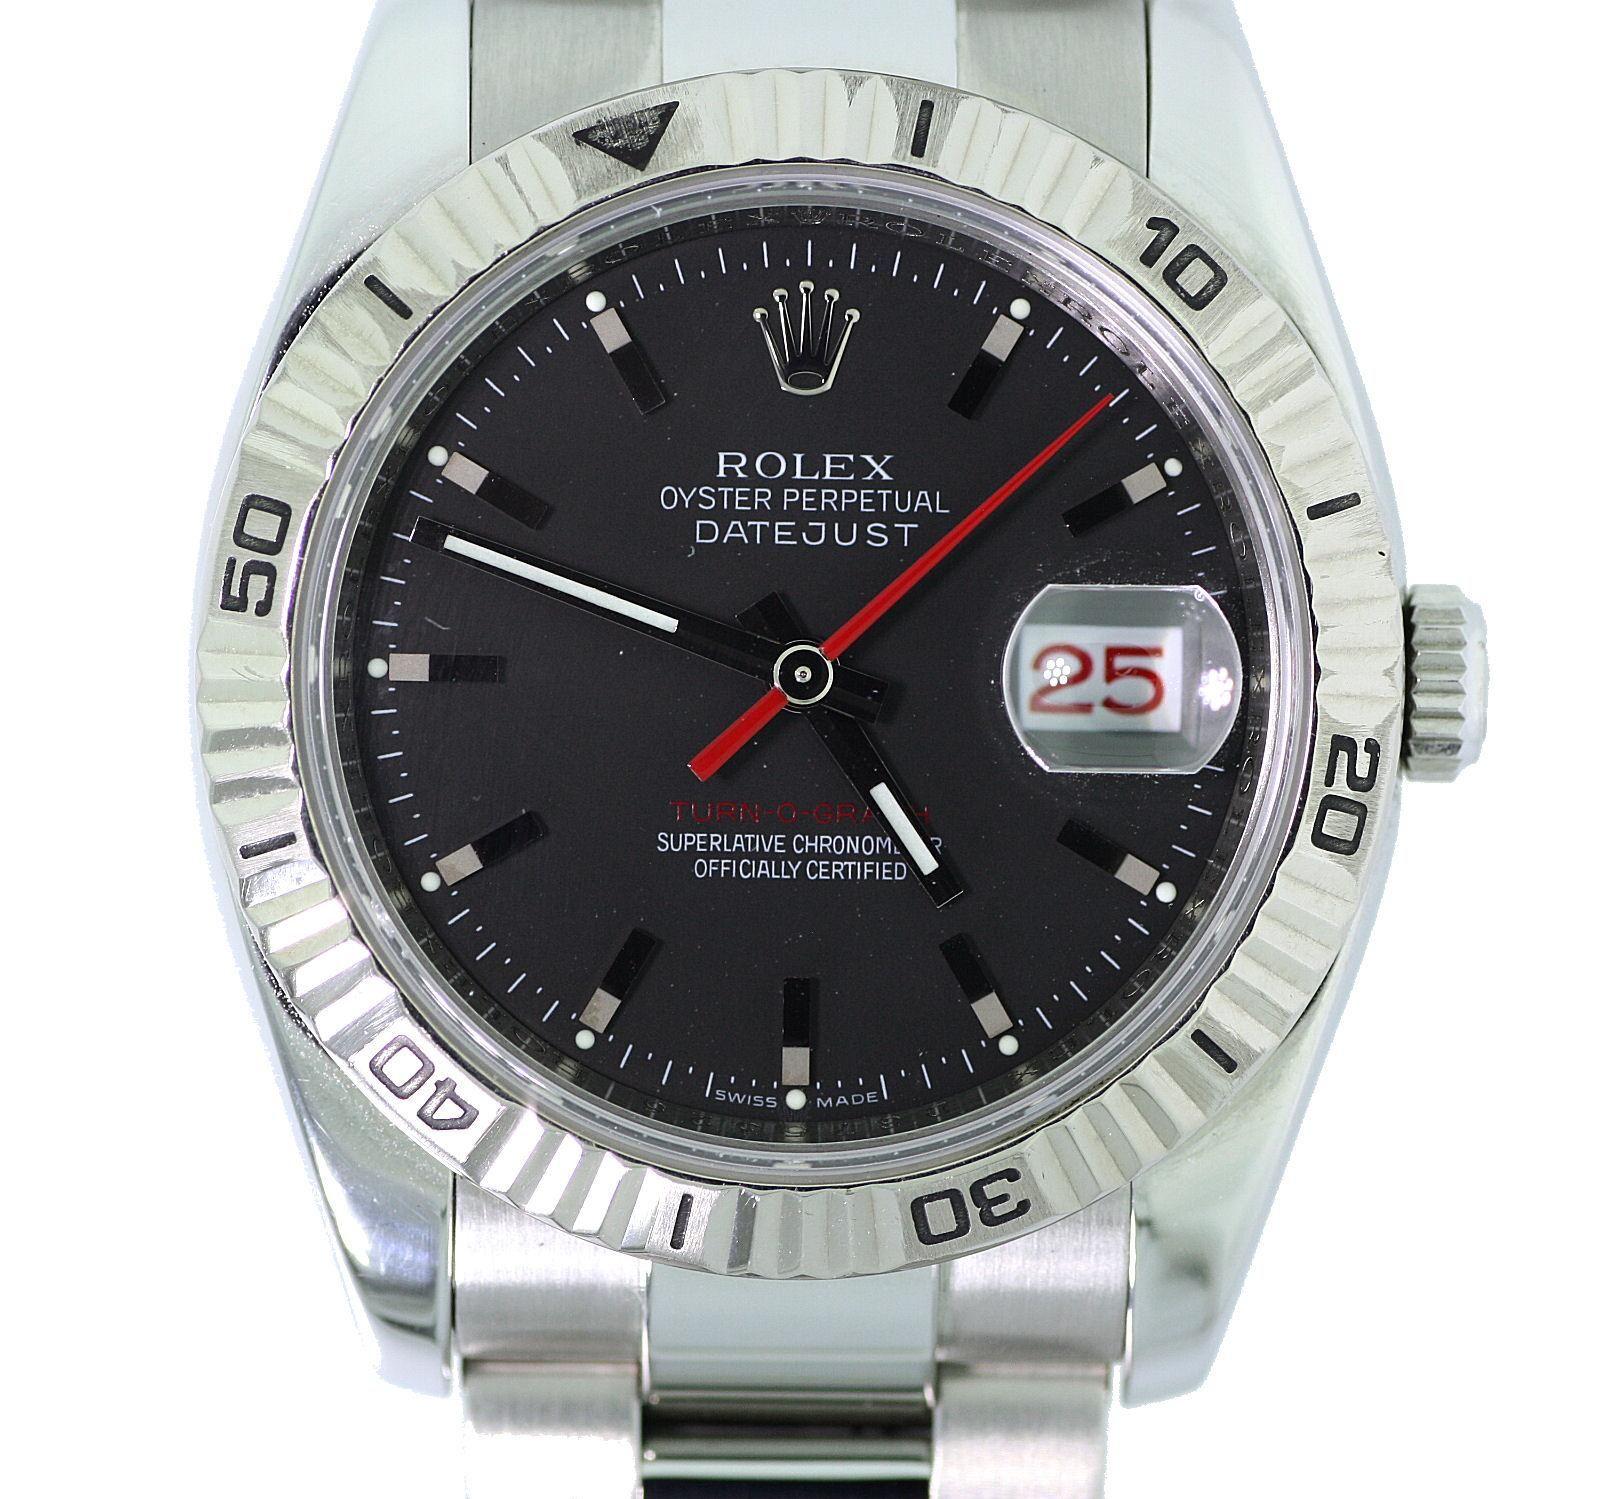 Men S Thunderbird Oyster Perpetual Rolex Date Just Rolex Rolex Oyster Datejust Rolex Date